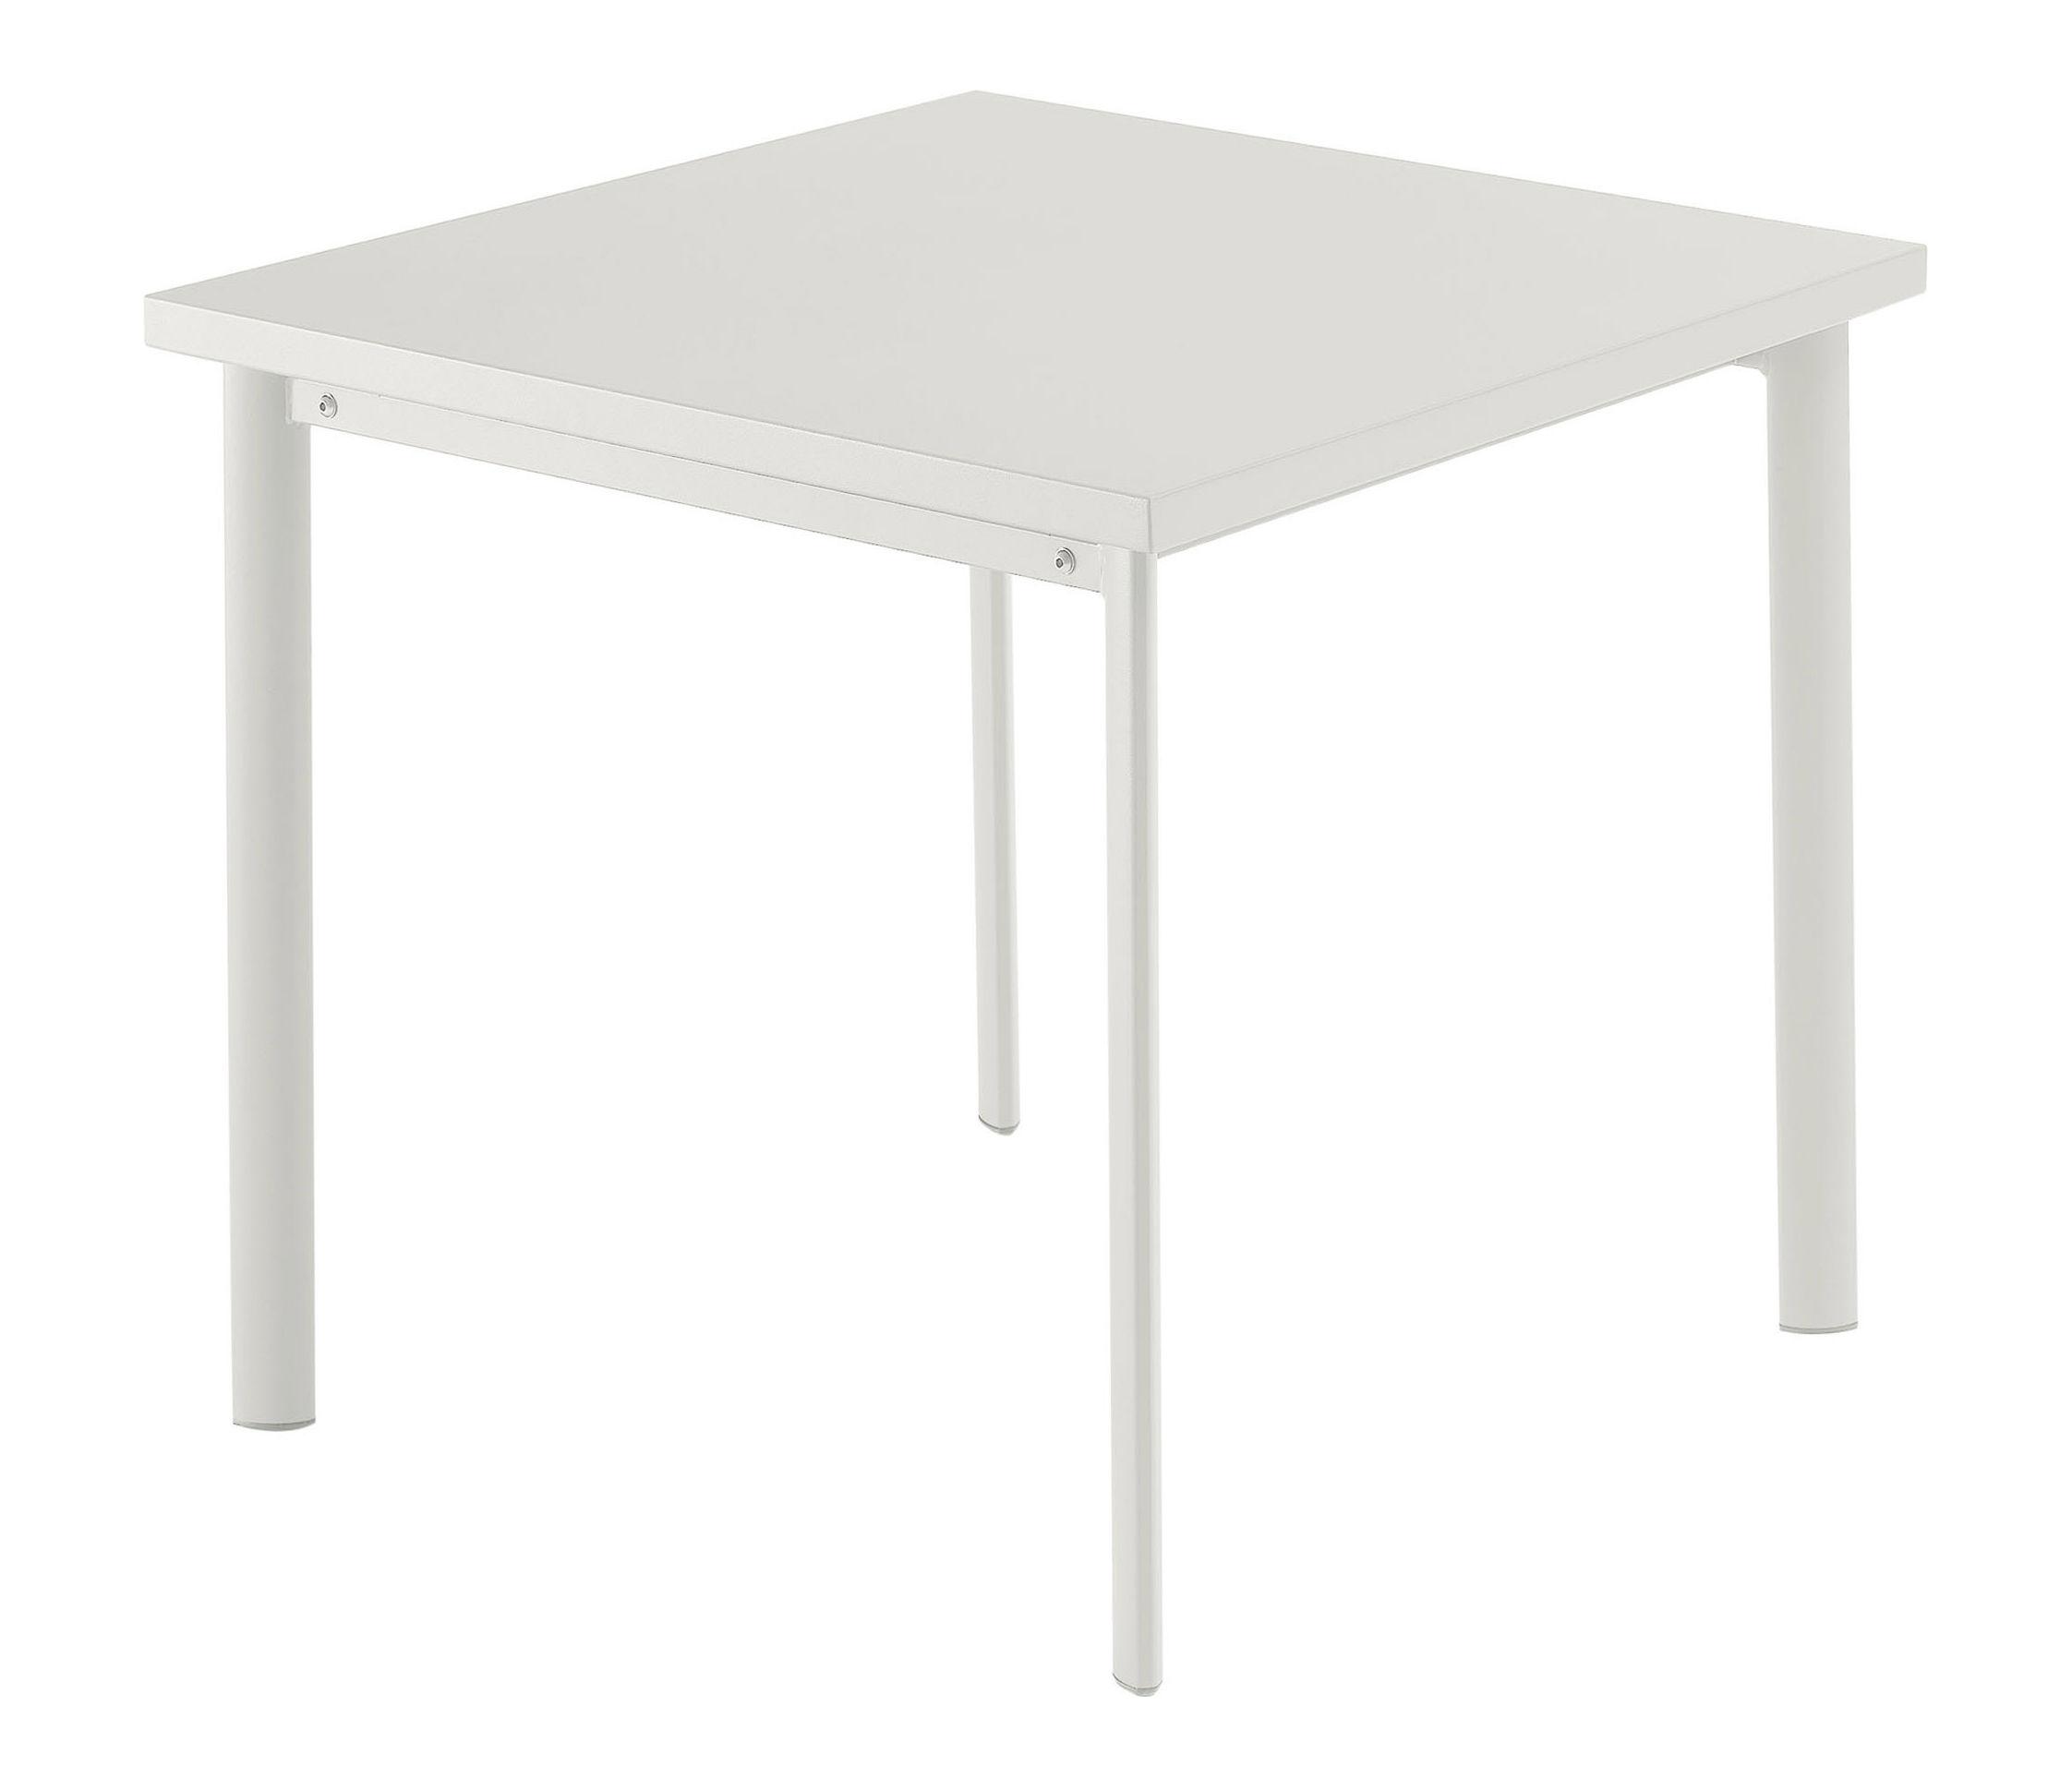 Jardin - Tables de jardin - Table Star / 70 x 70 cm - Emu - Blanc mat - Acier verni, Inox, Tôle galvanisée